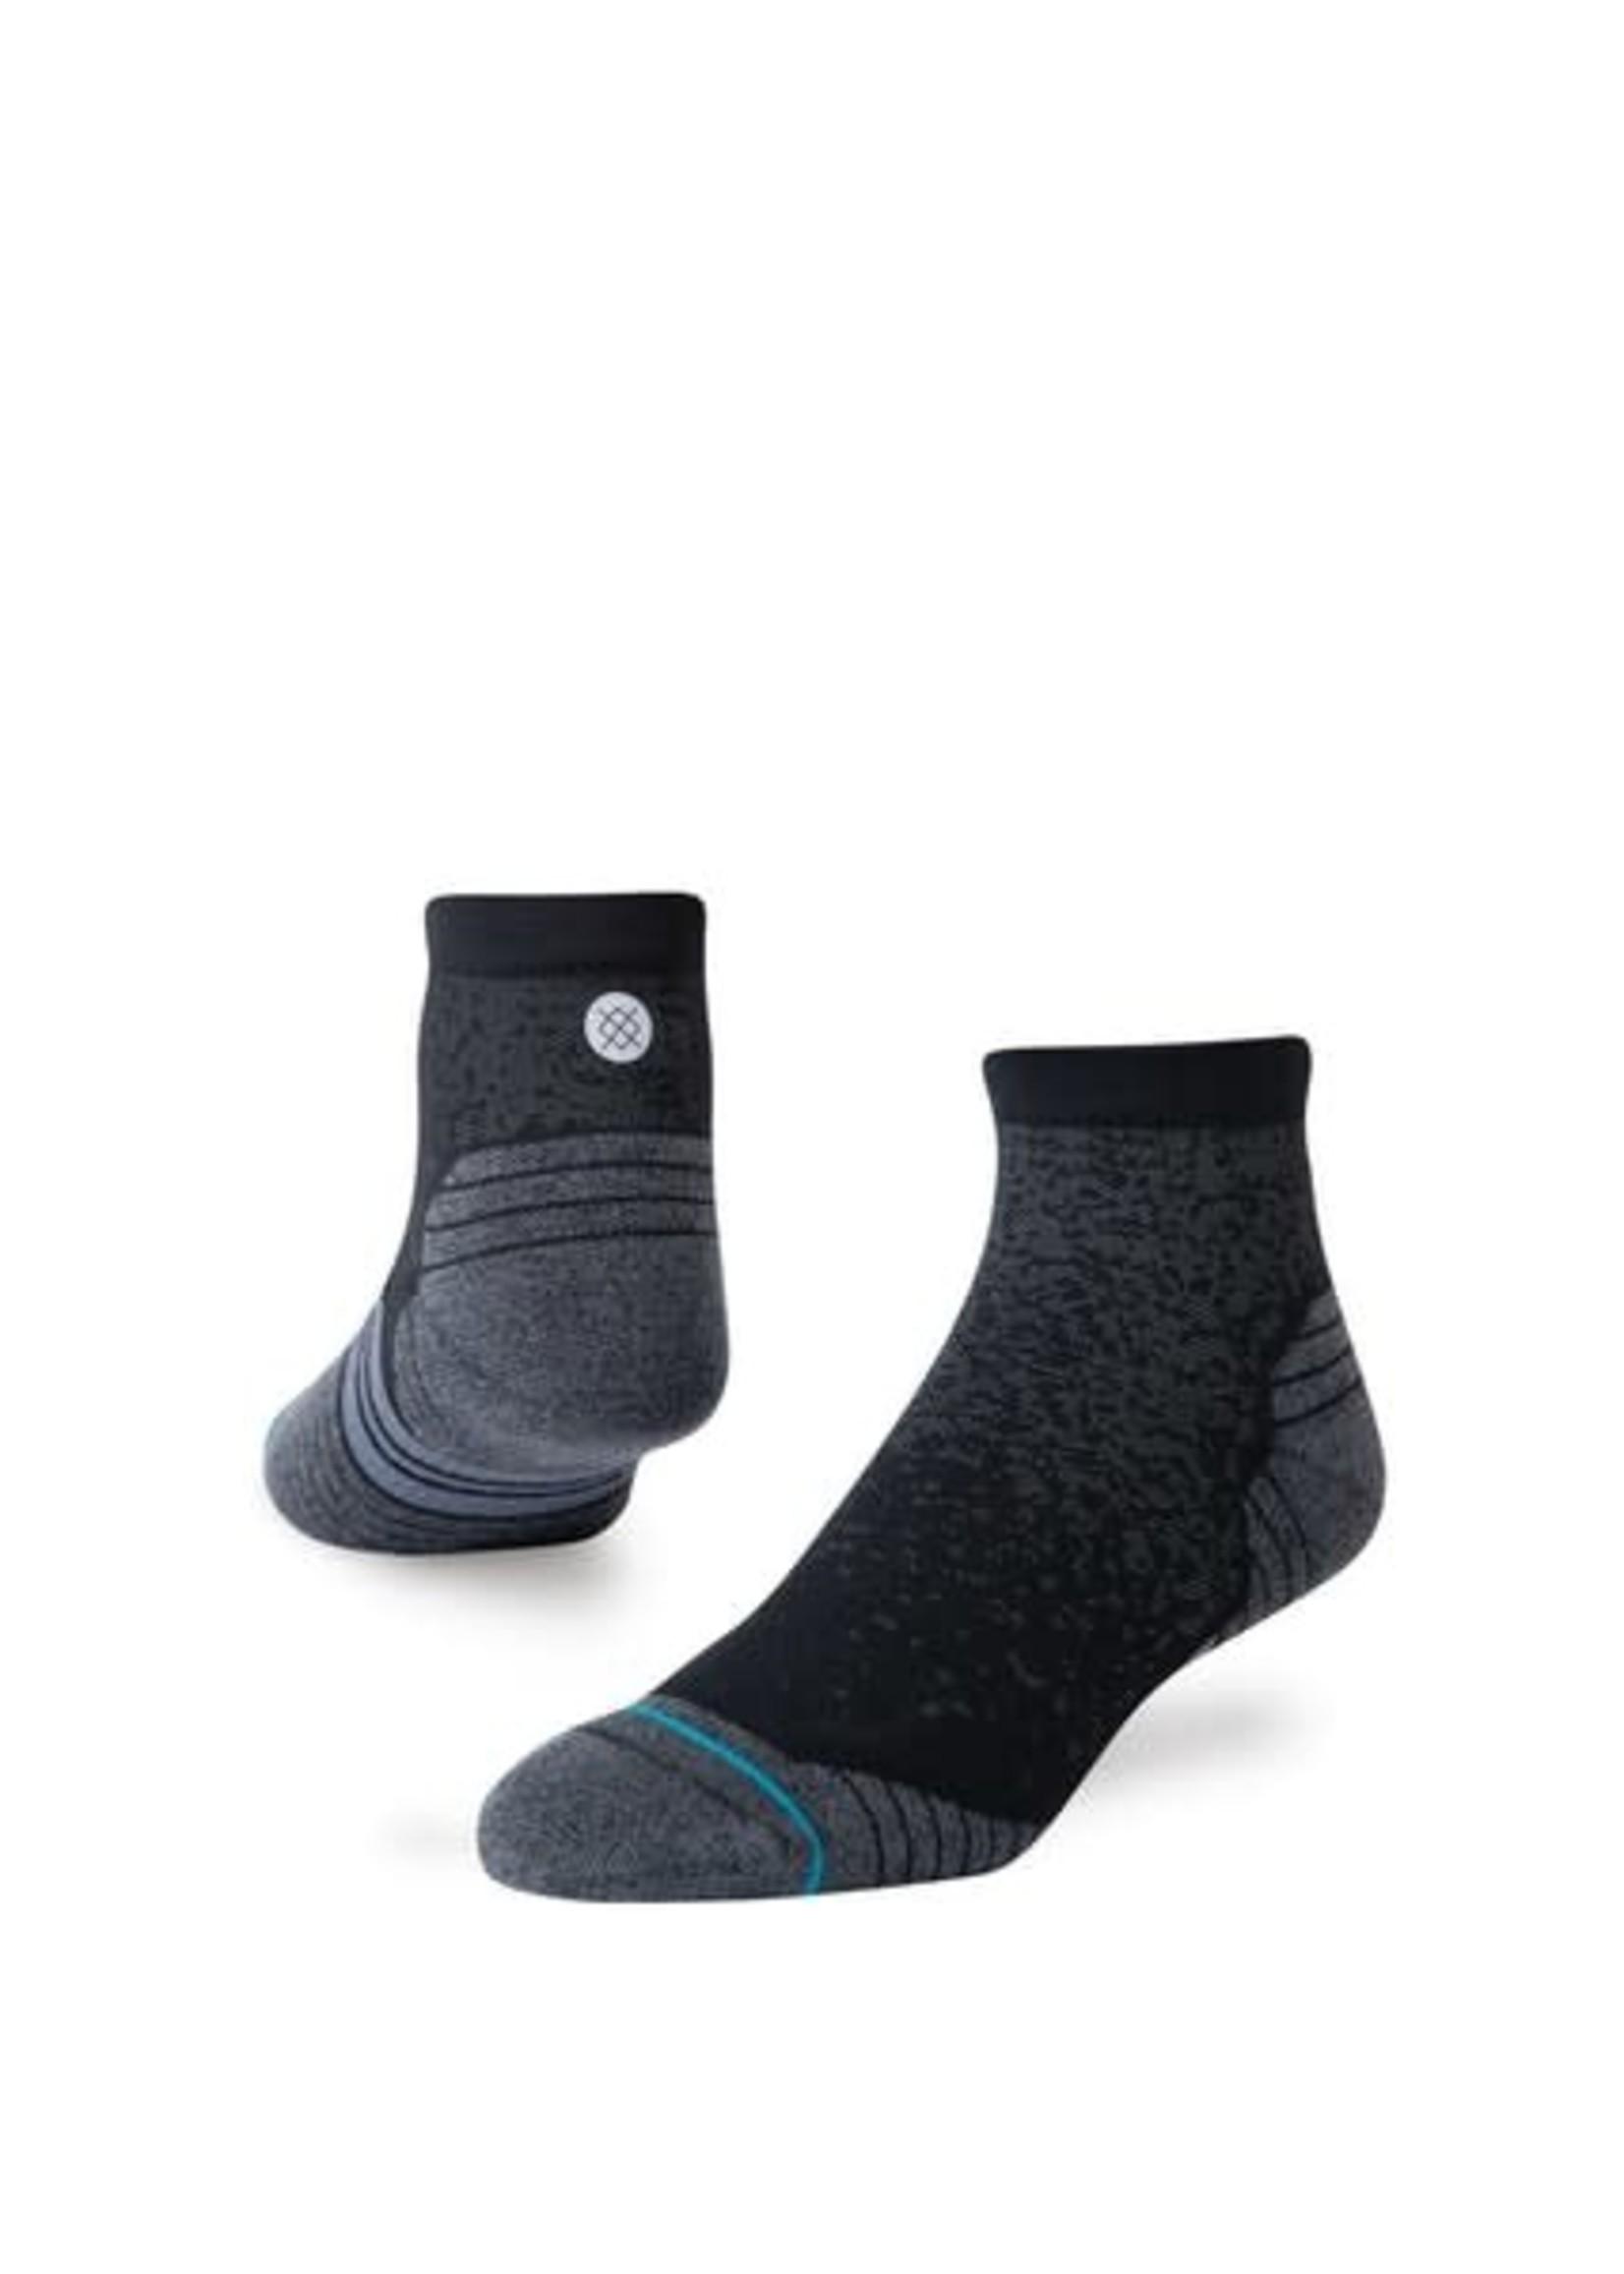 Stance Stance Run QTR ST Socks